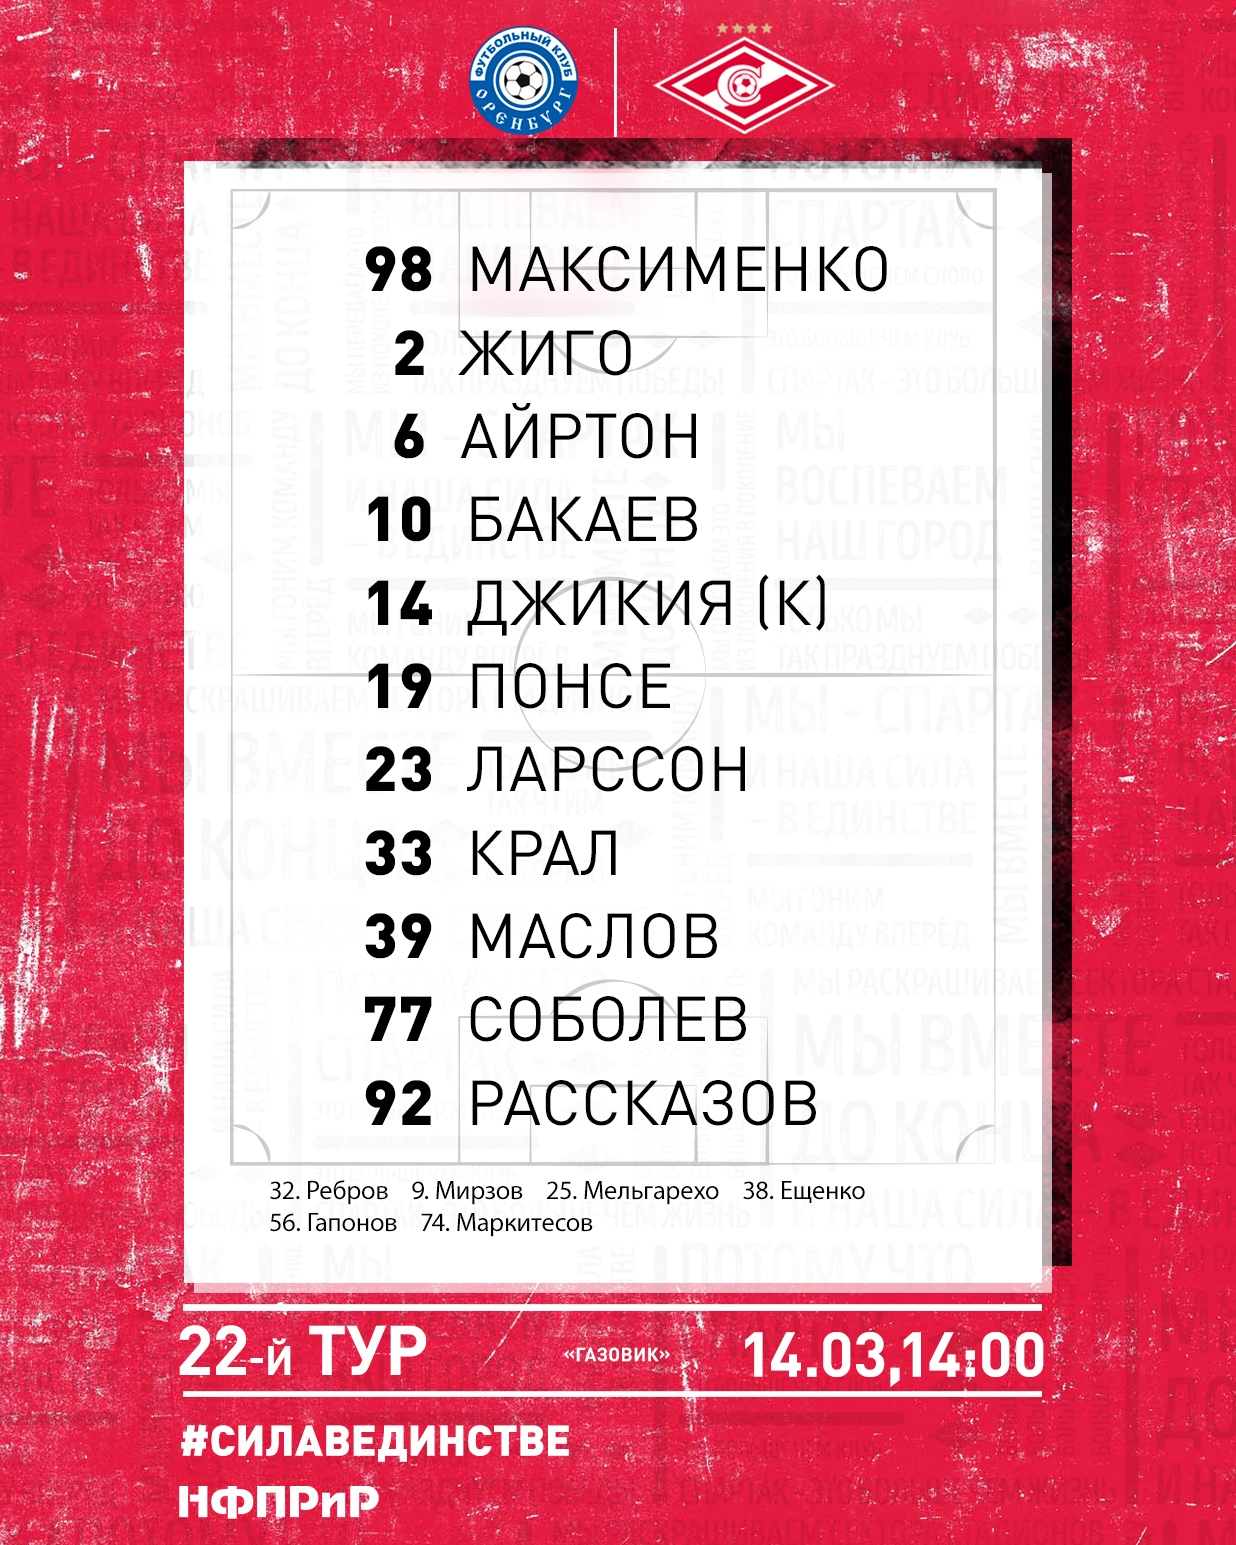 Состав «Спартака» на матч с «Оренбургом»